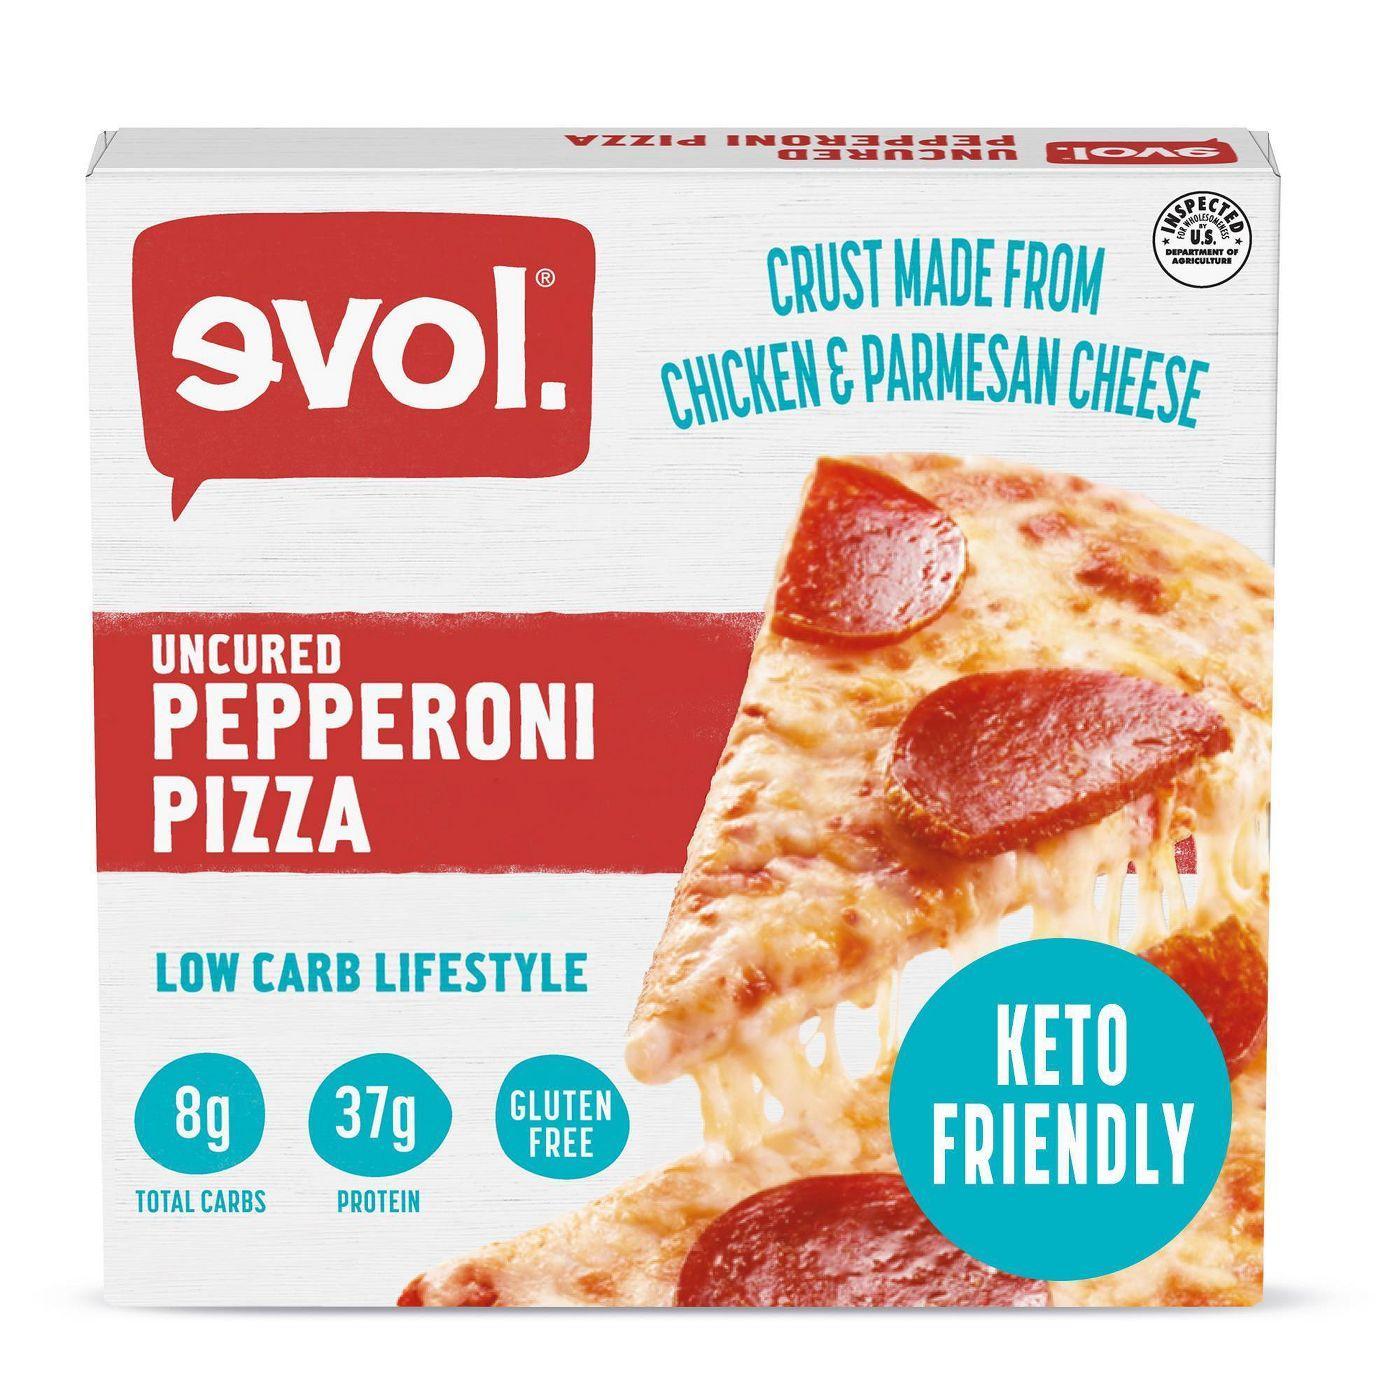 Evol Uncured Pepperoni Pizza